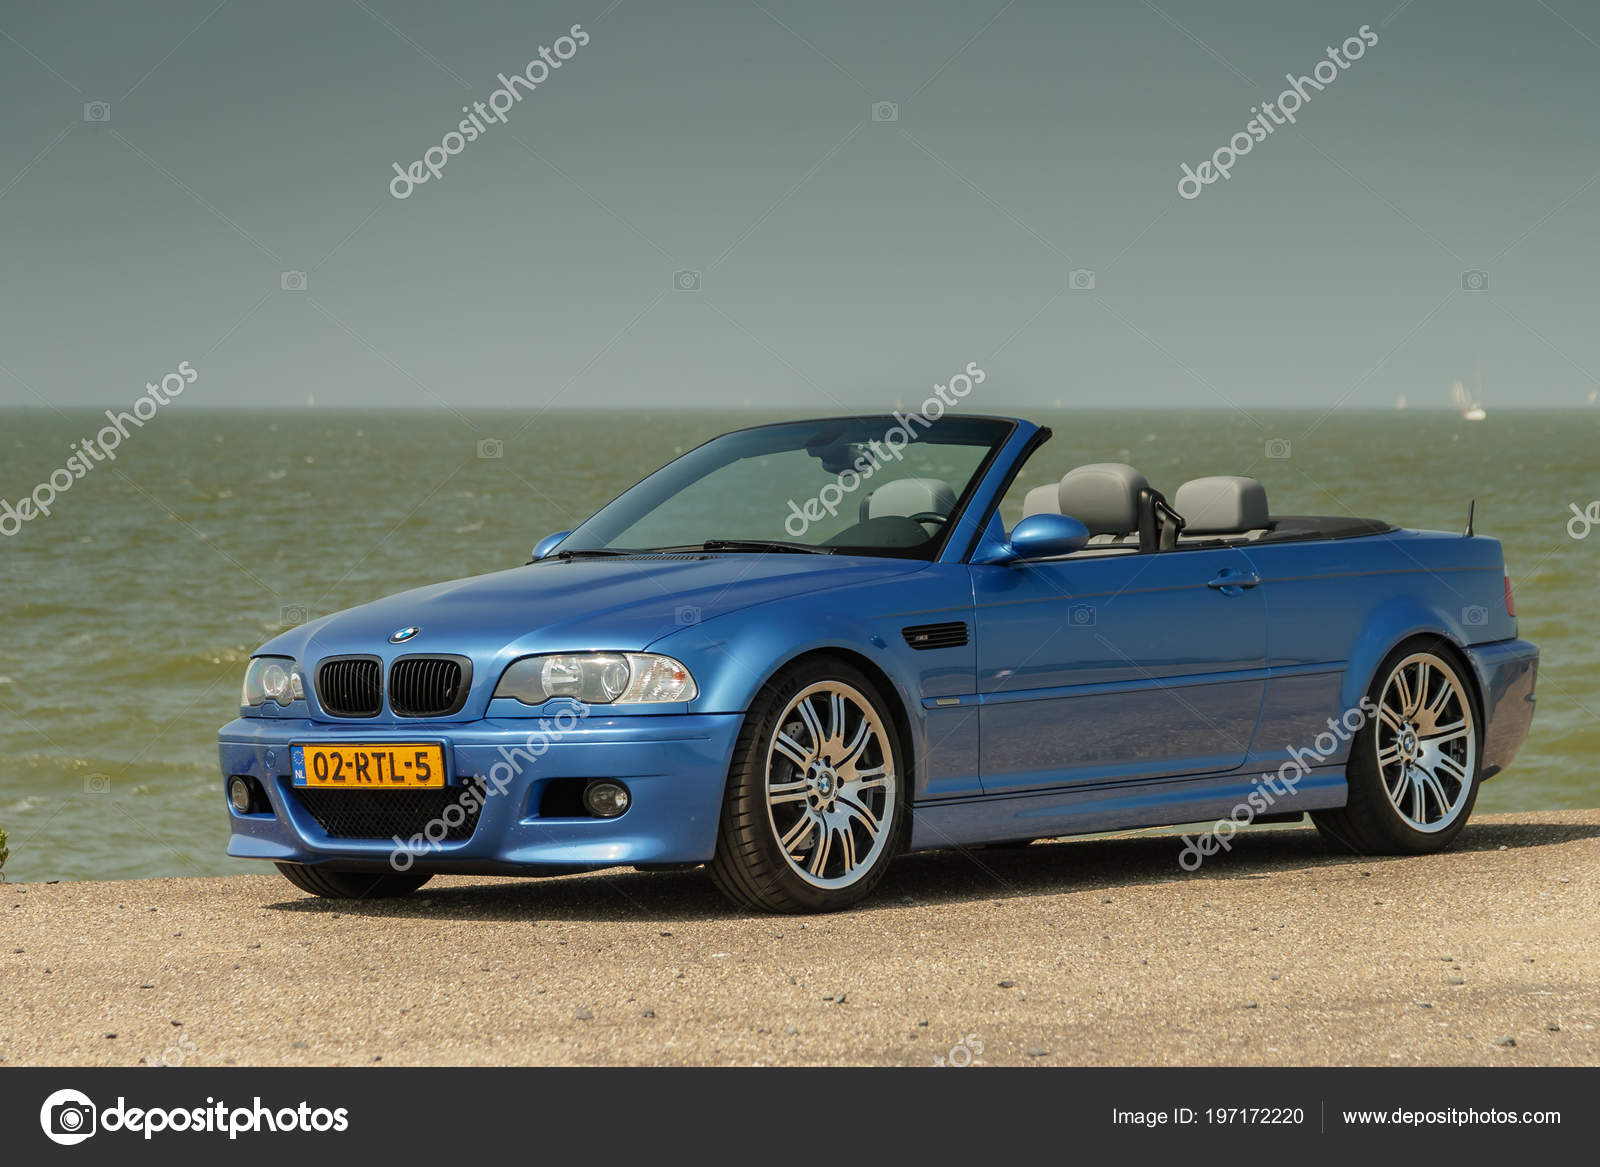 Netherlands May 2018 Convertible Bmw E46 Standing Outdoors Ijsselmeer Sunny Stock Editorial Photo C Mennoschaefer 197172220